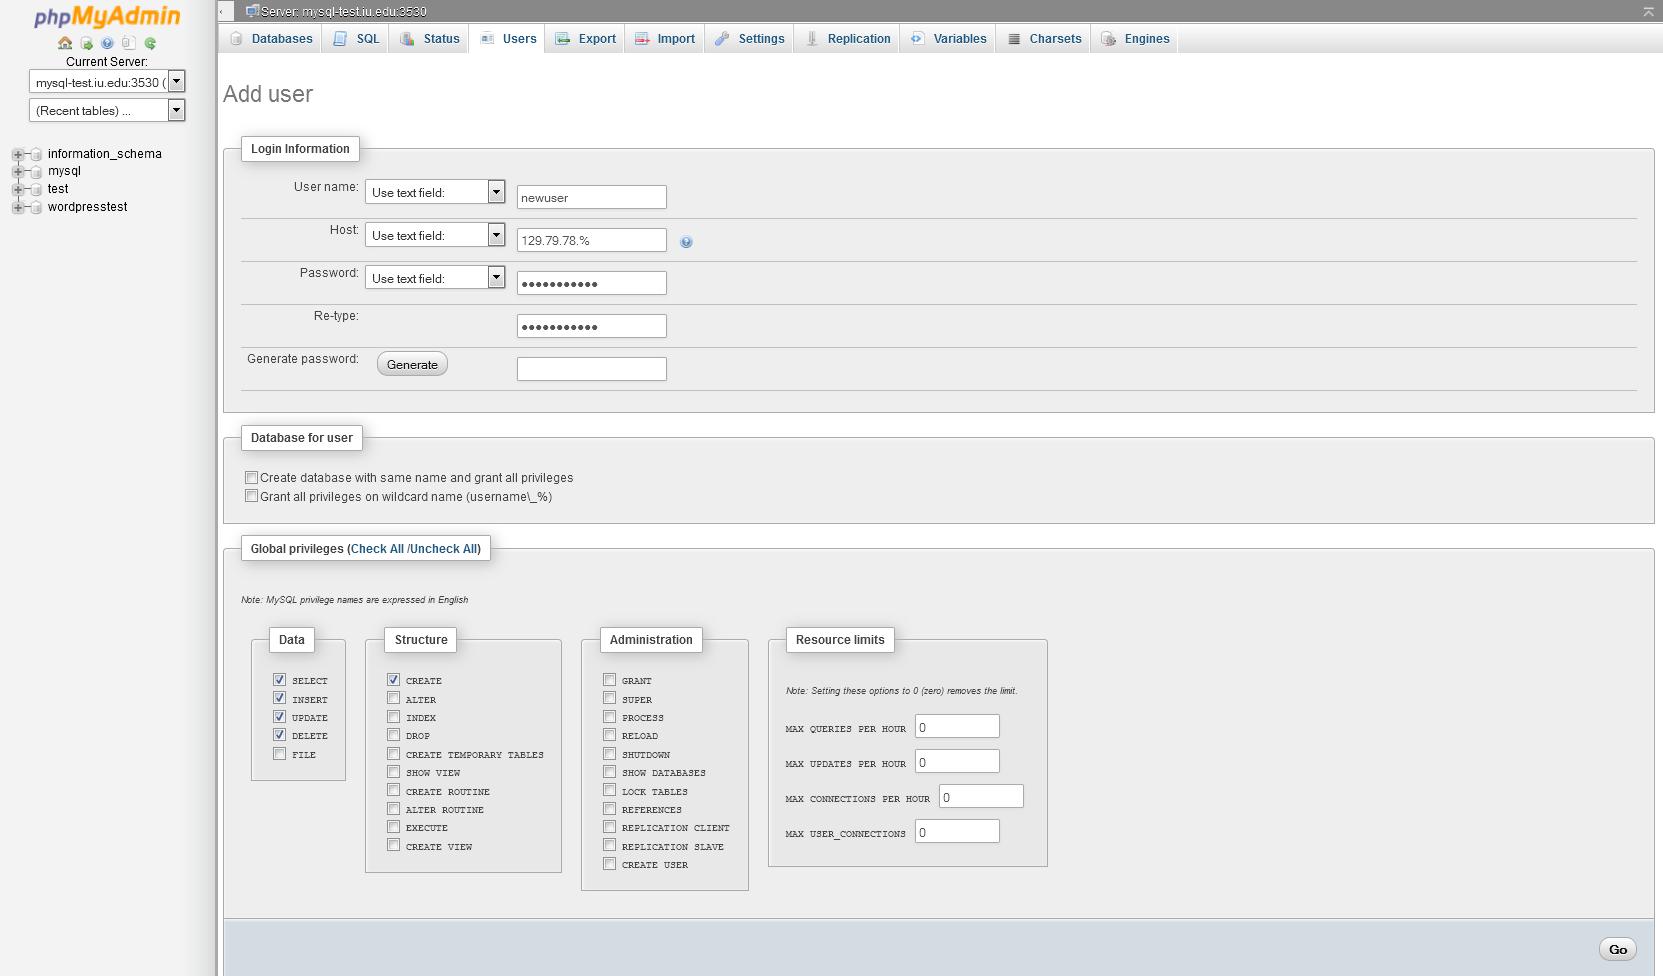 phpMyAdmin Add user page